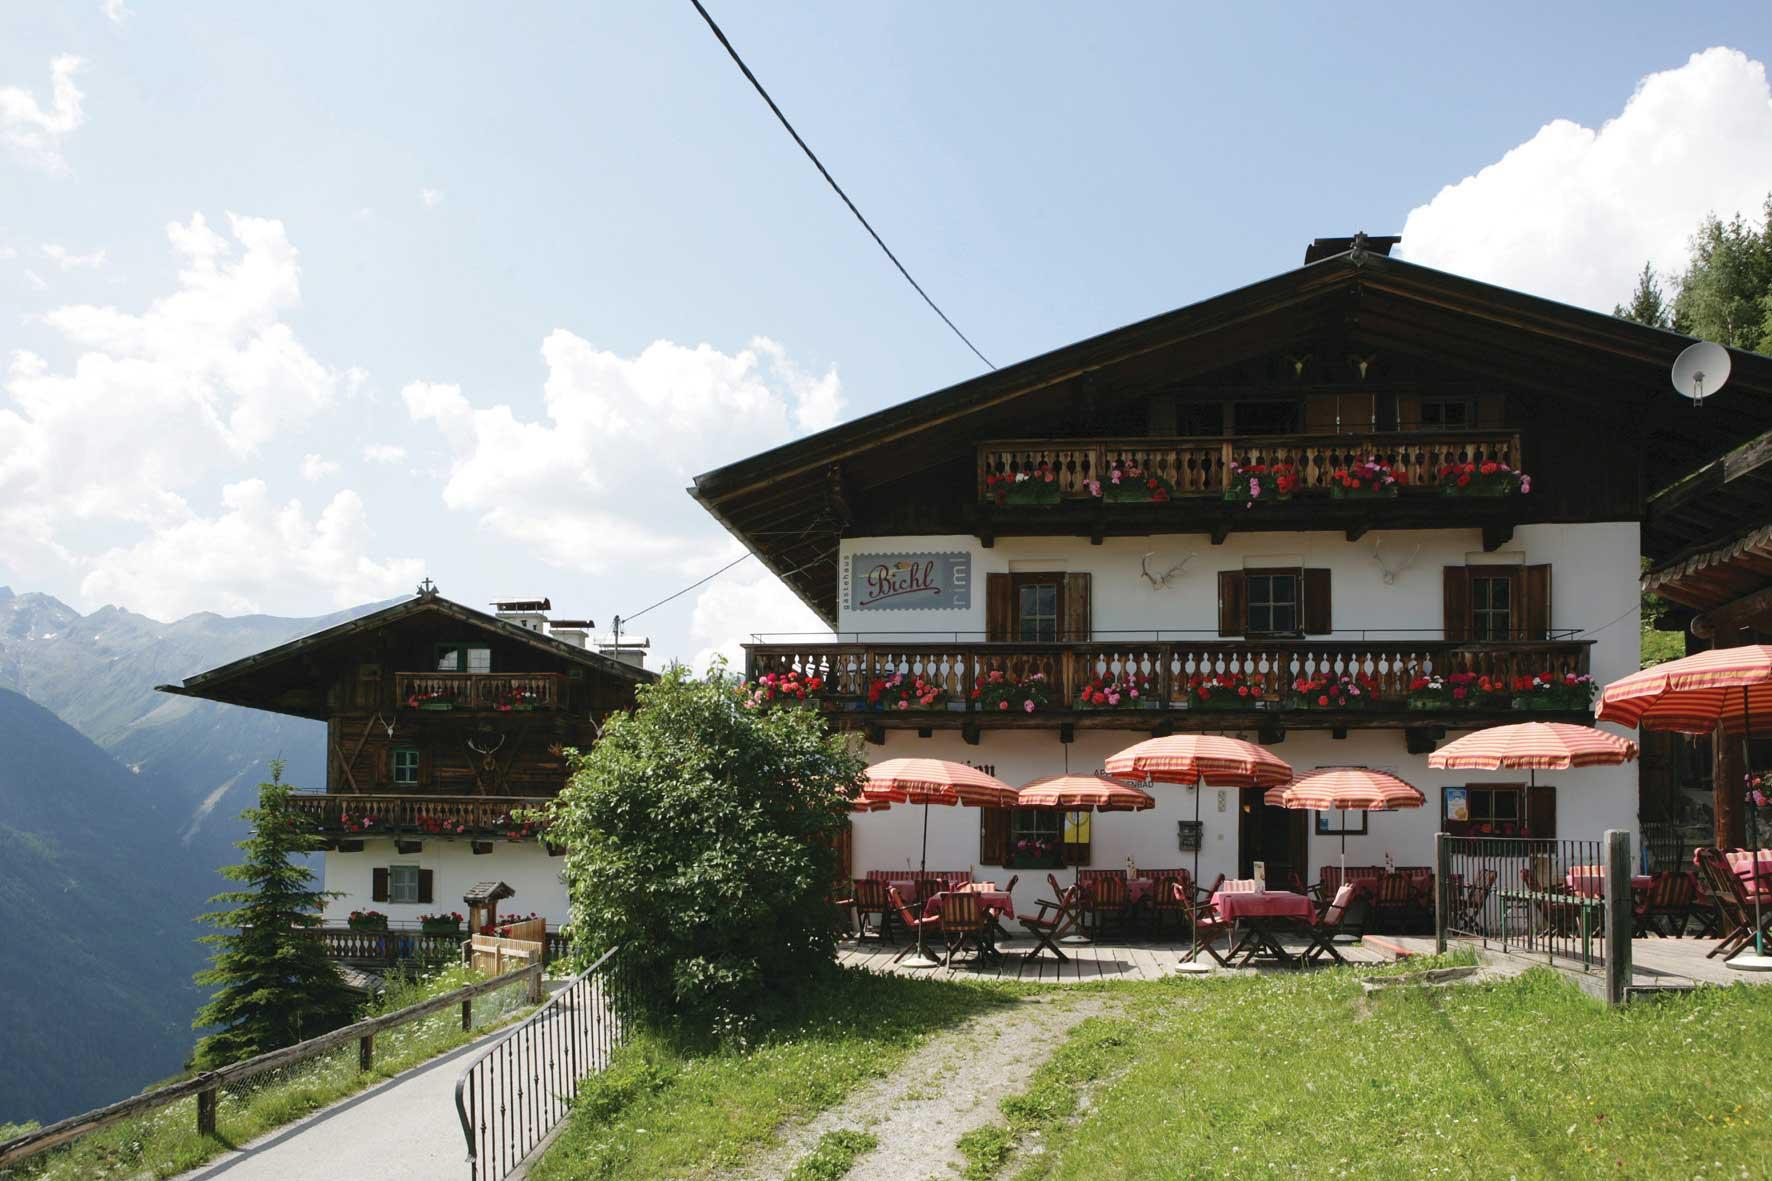 Jausenstation Bichl - Hütten Ötztal